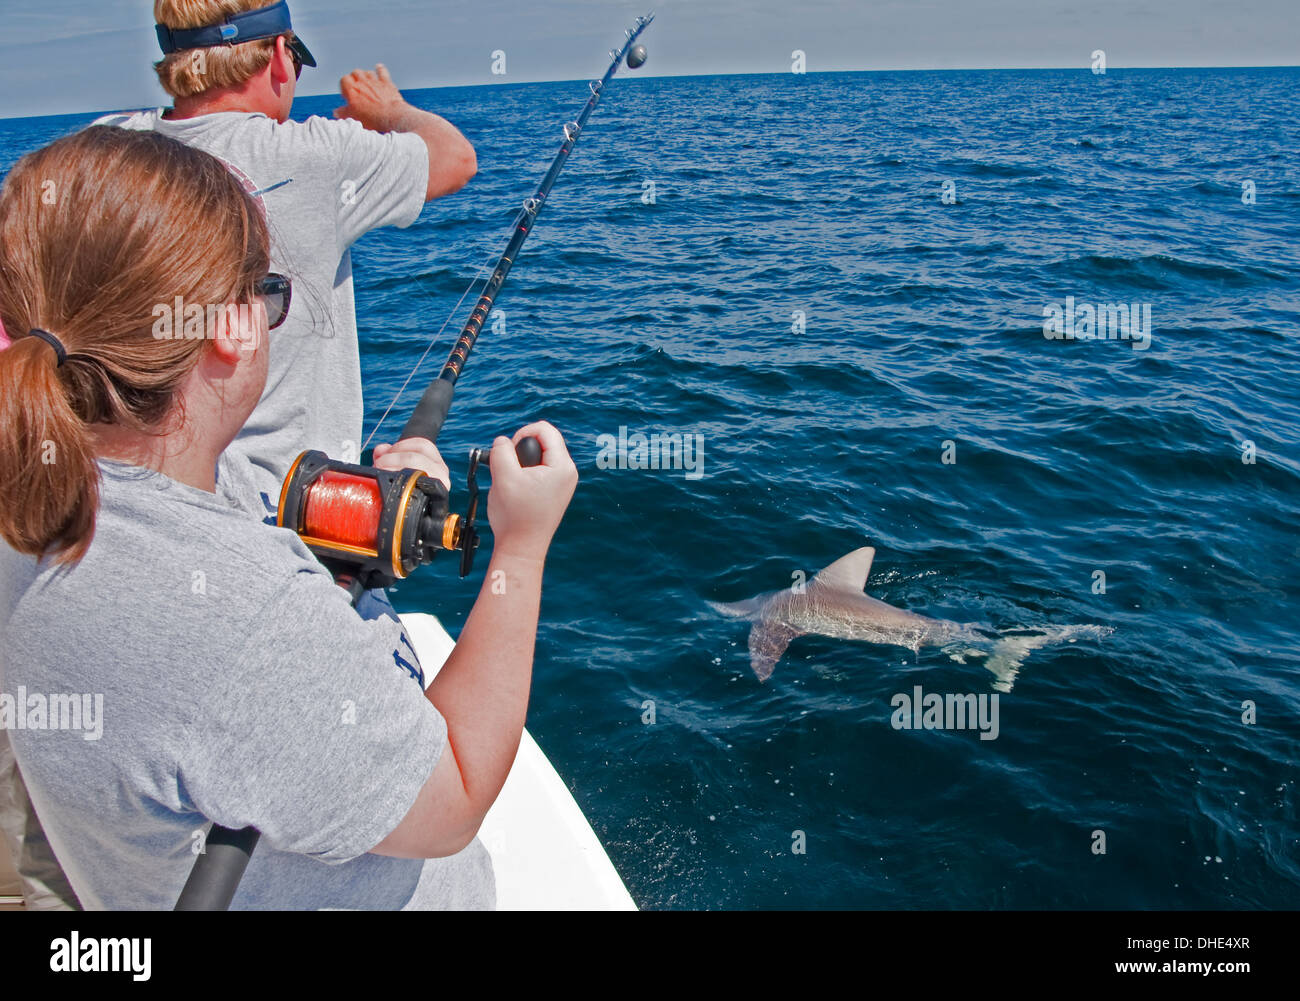 Alabama Gulf Coast charter fishing with shark on line. - Stock Image